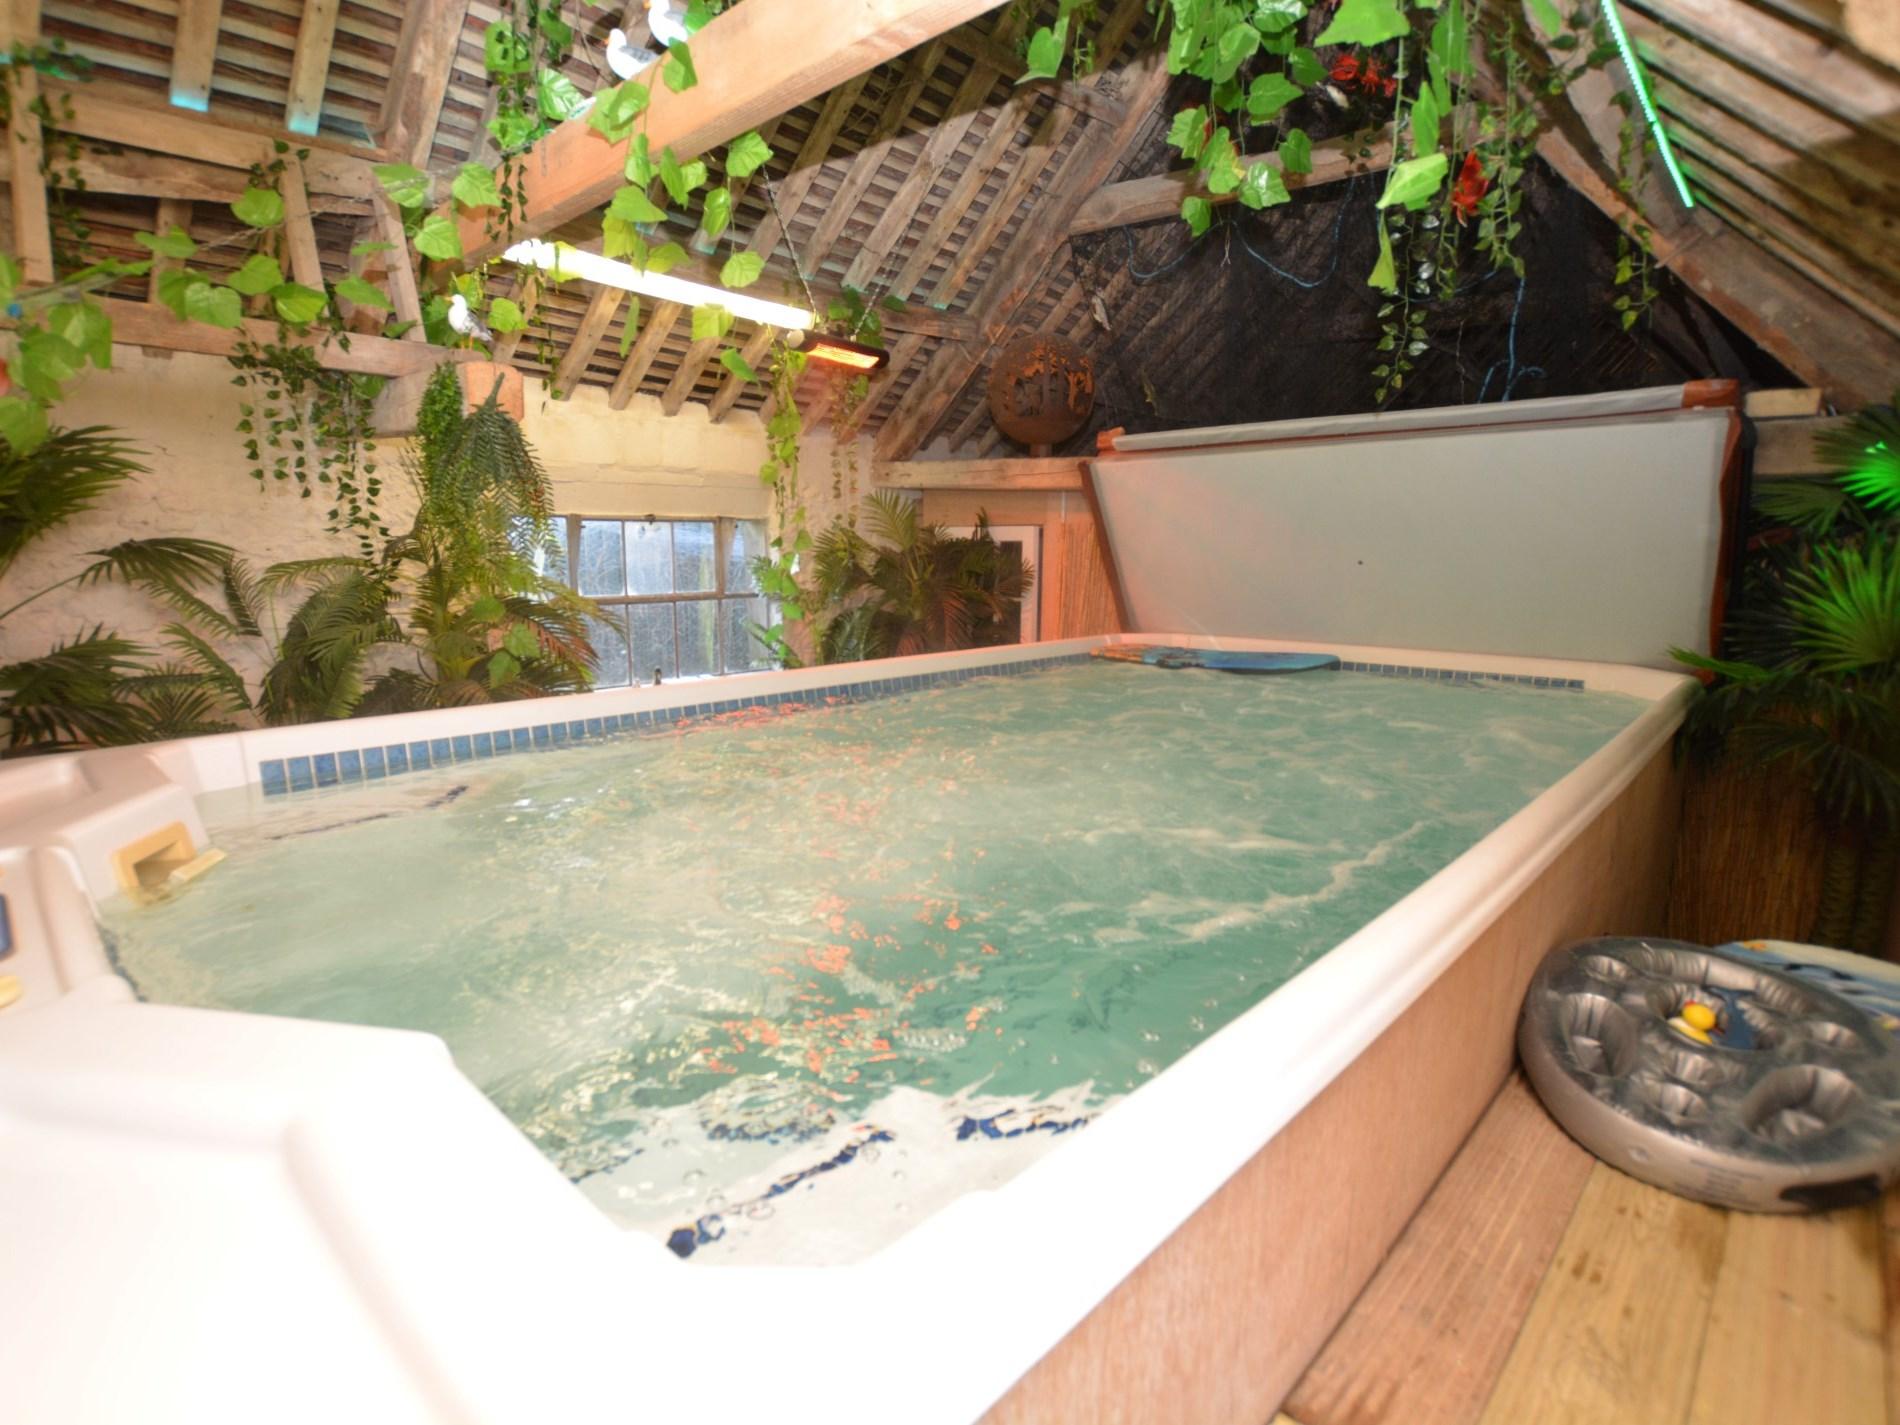 2 Bedroom Cottage in Dorchester, Dorset and Somerset